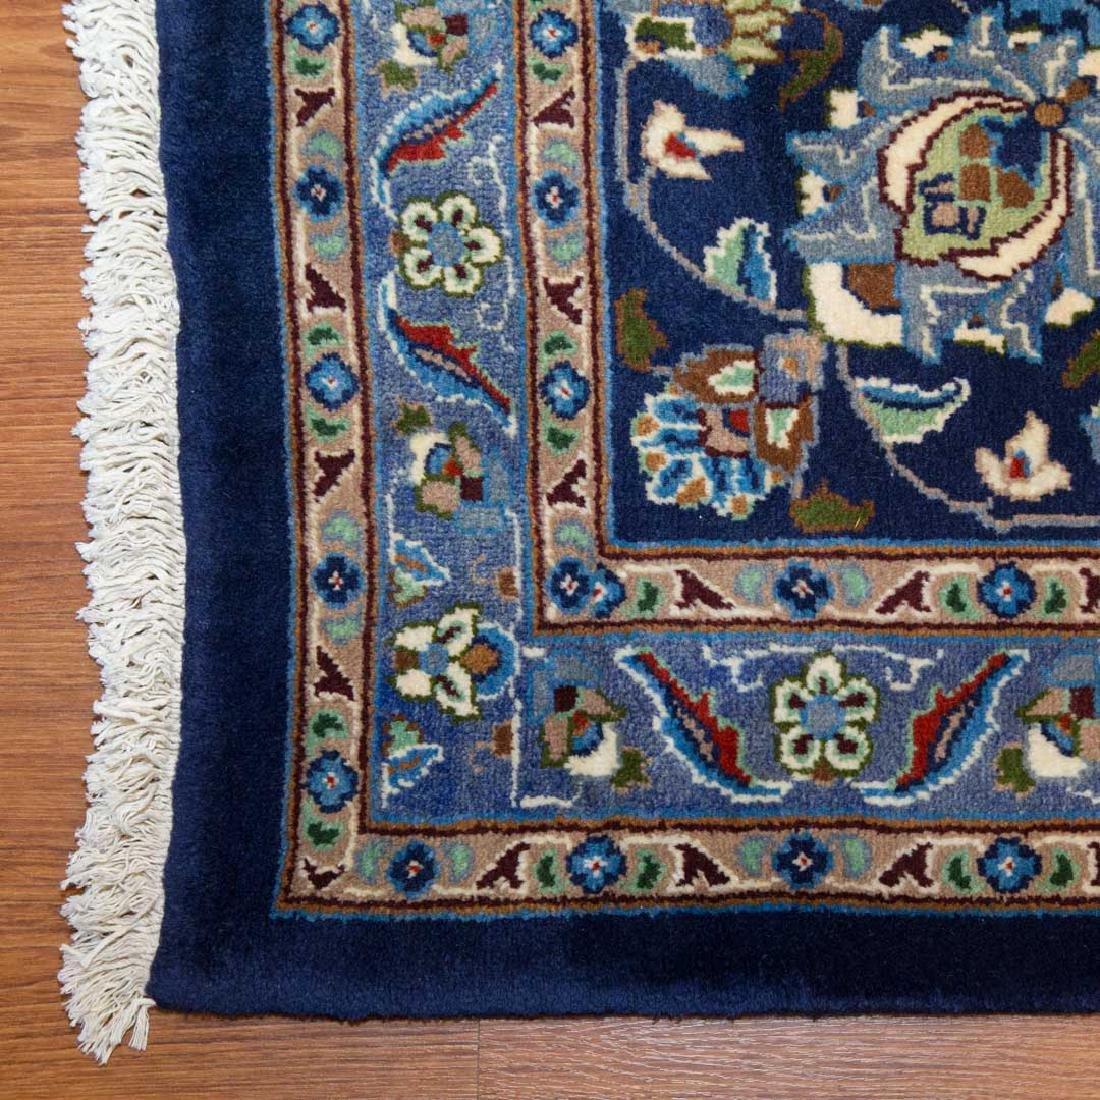 Persian Keshan carpet, approx. 10 x 13 - 2